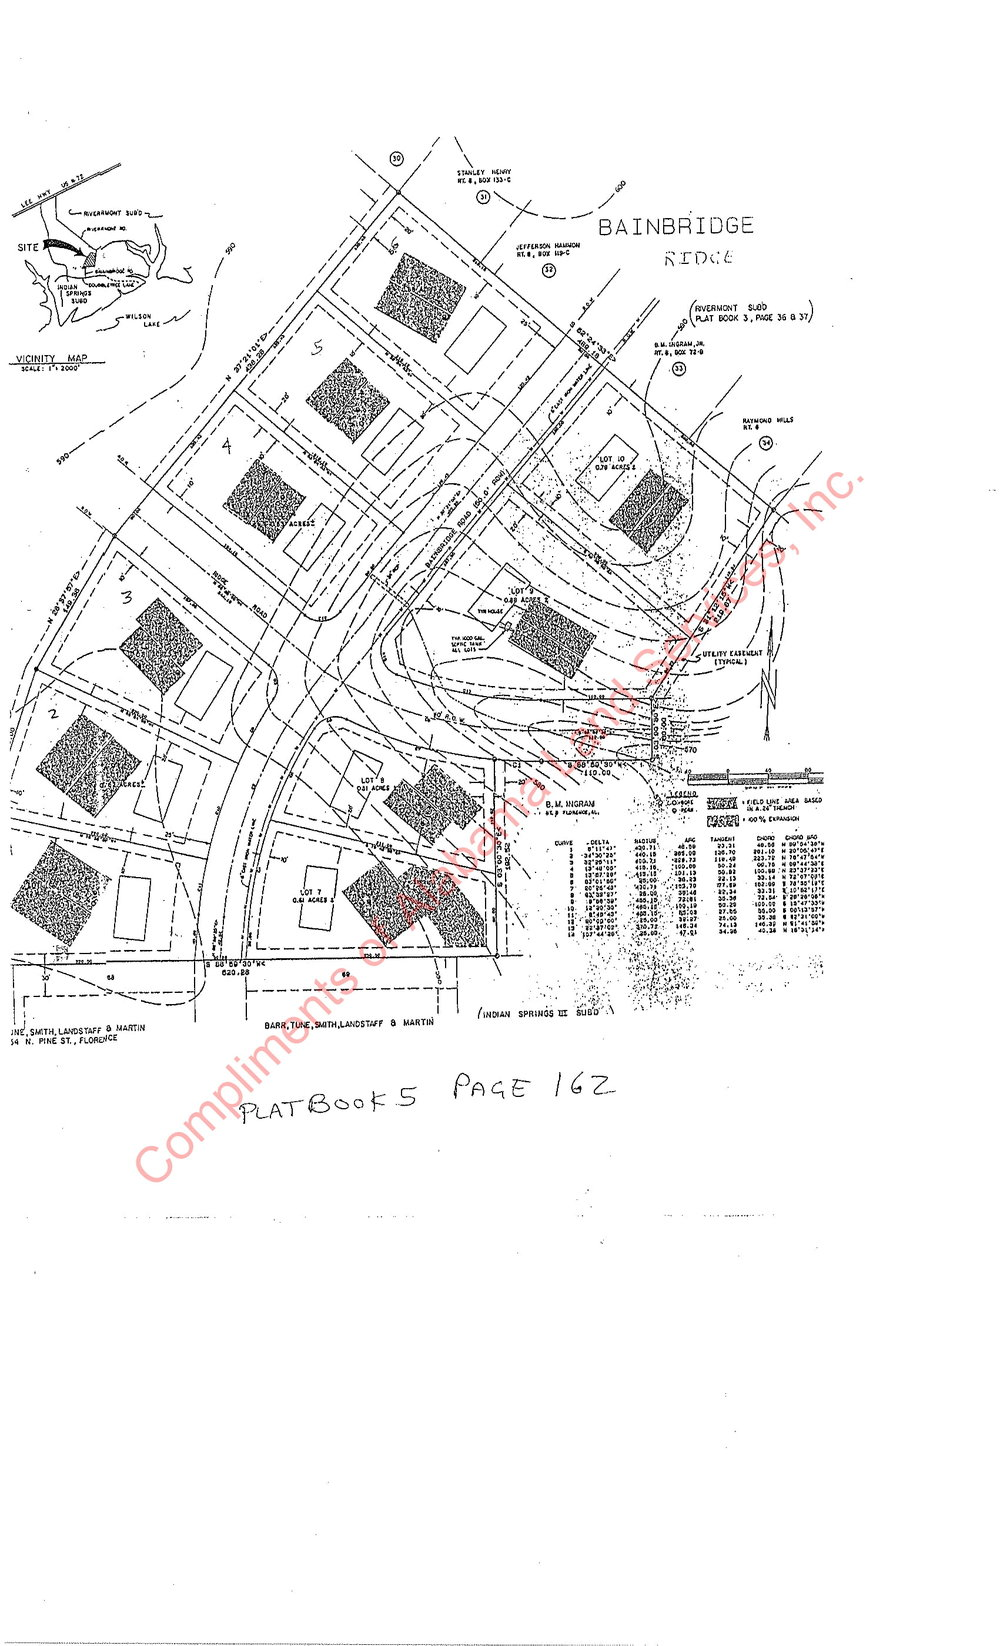 Bainbridge Ridge plat-1.jpg